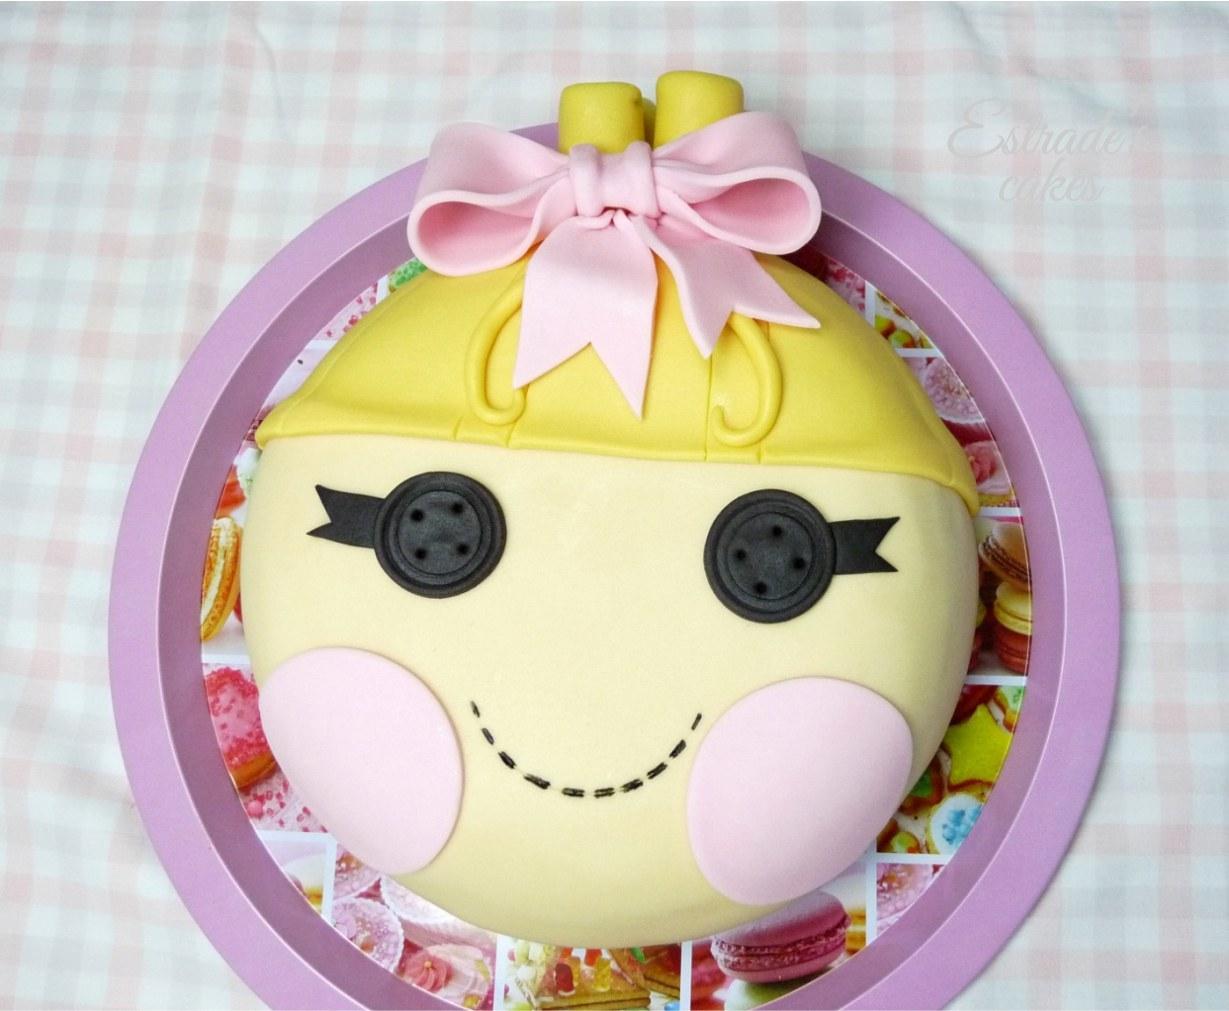 Estrade S Cakes Una Tarta Lalaloopsy